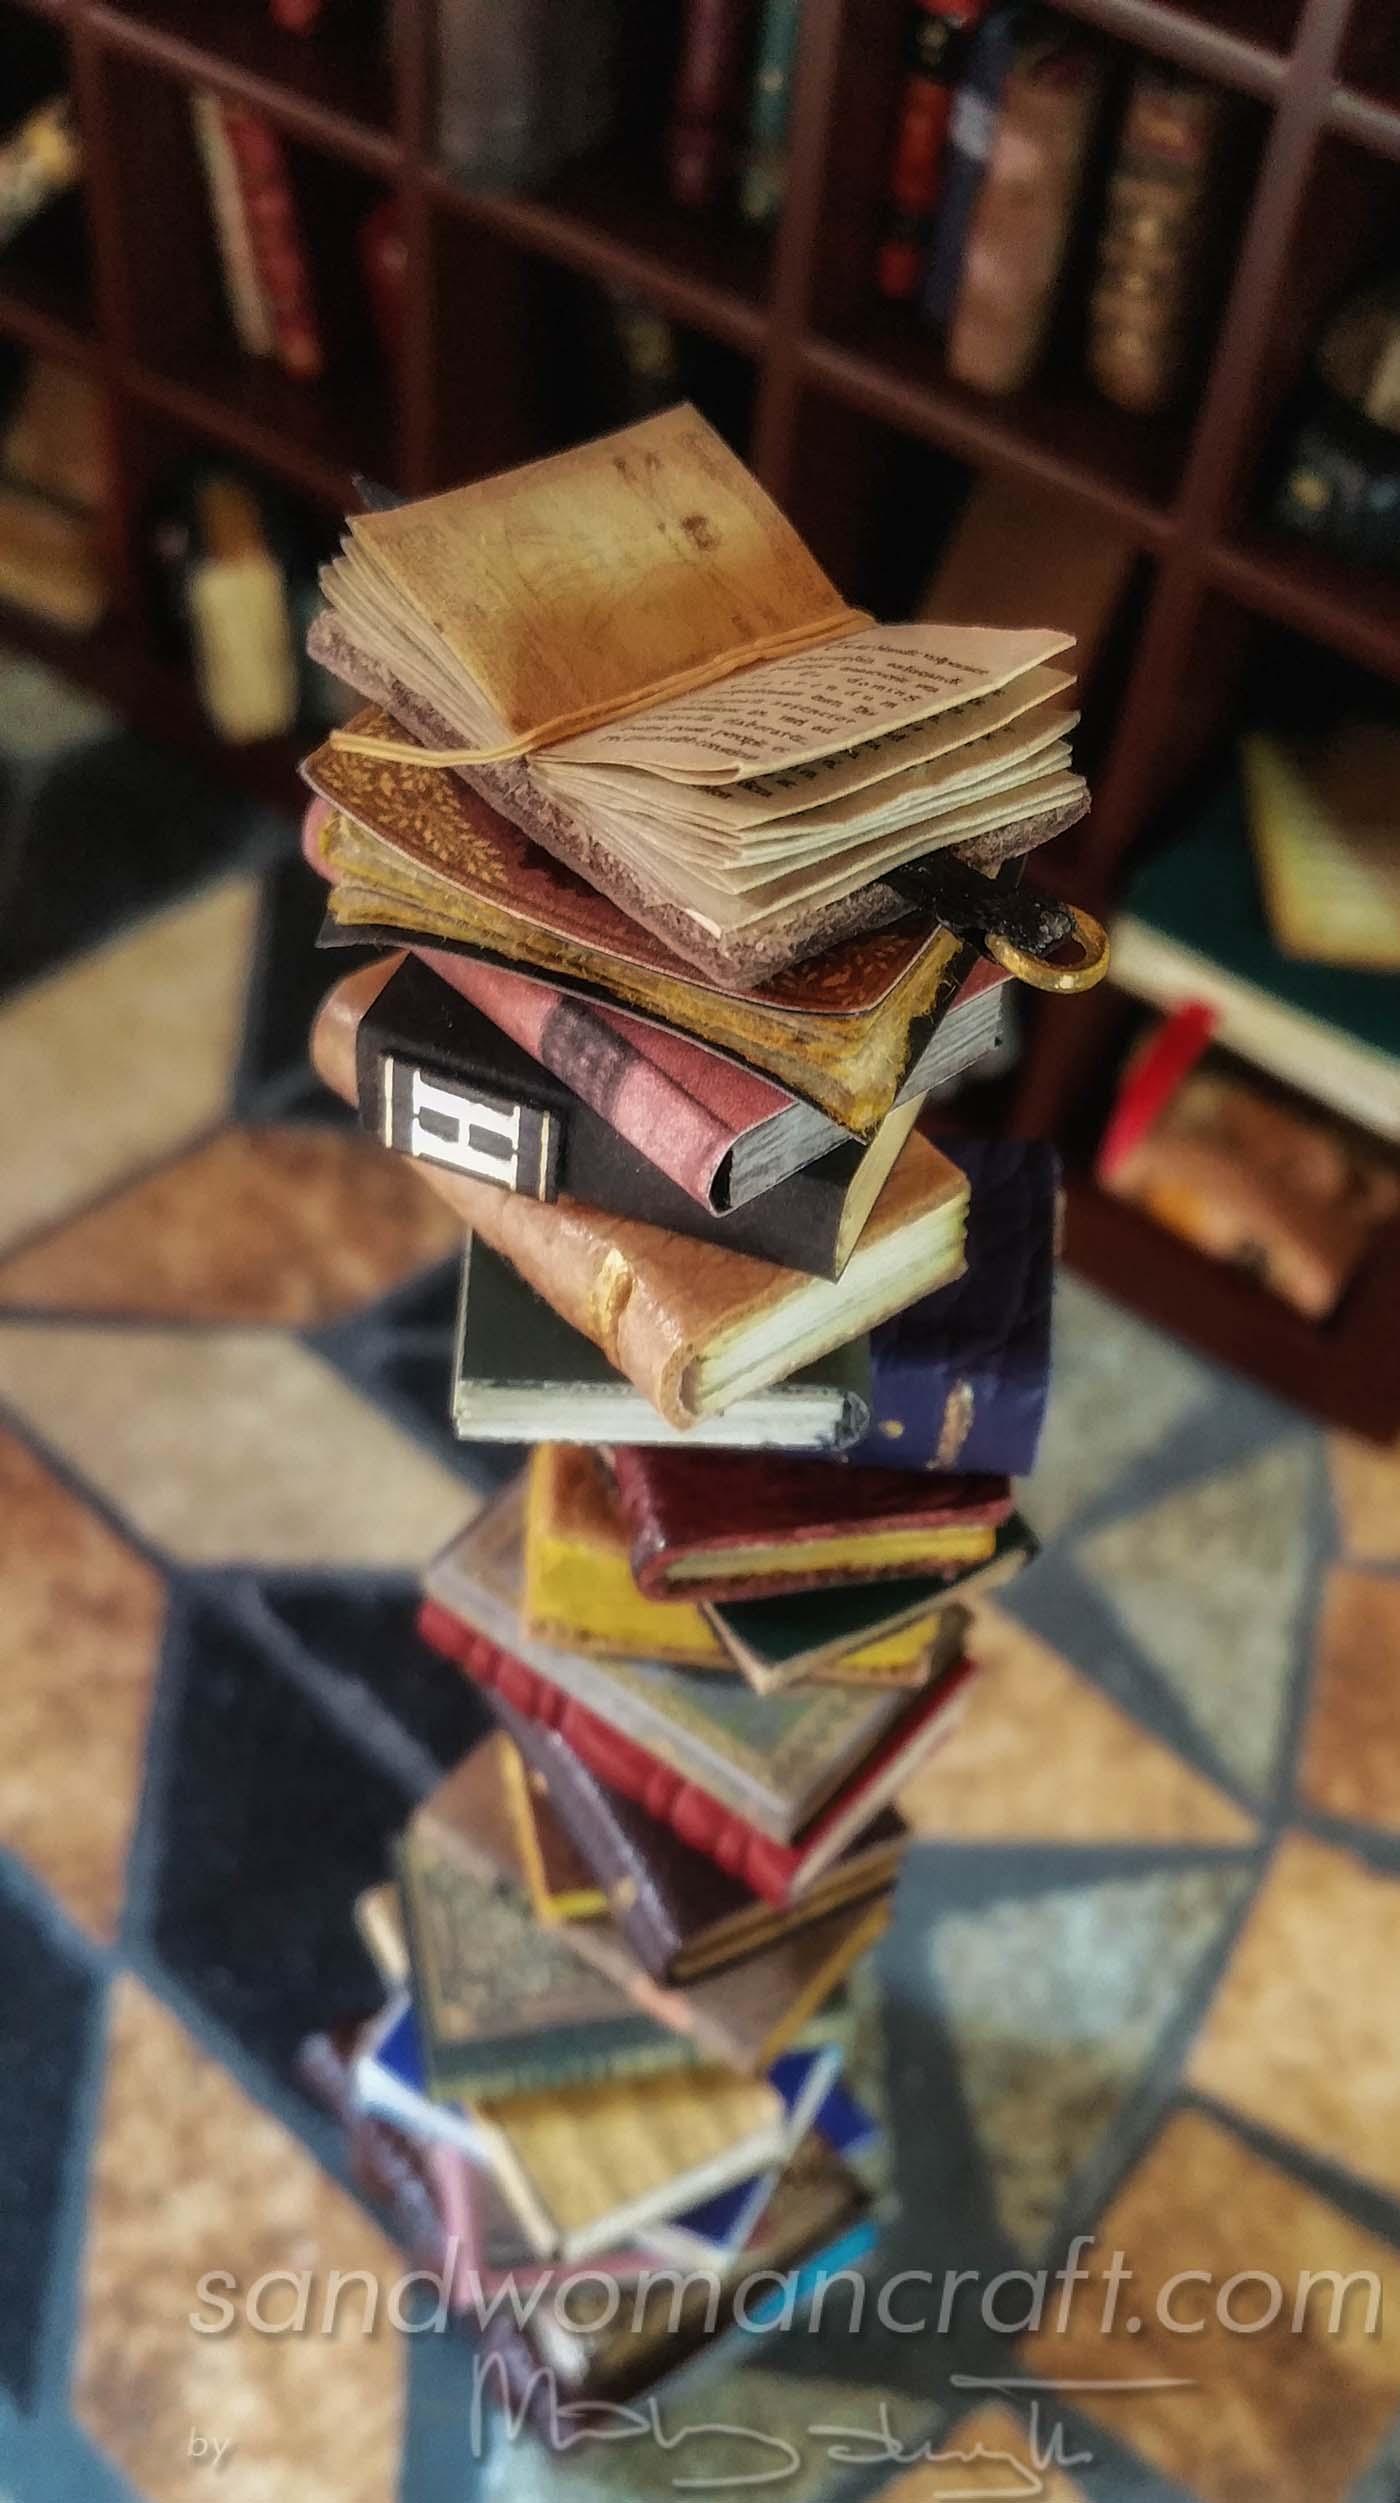 Miniature book stack with Leonardo Da Vinci open book